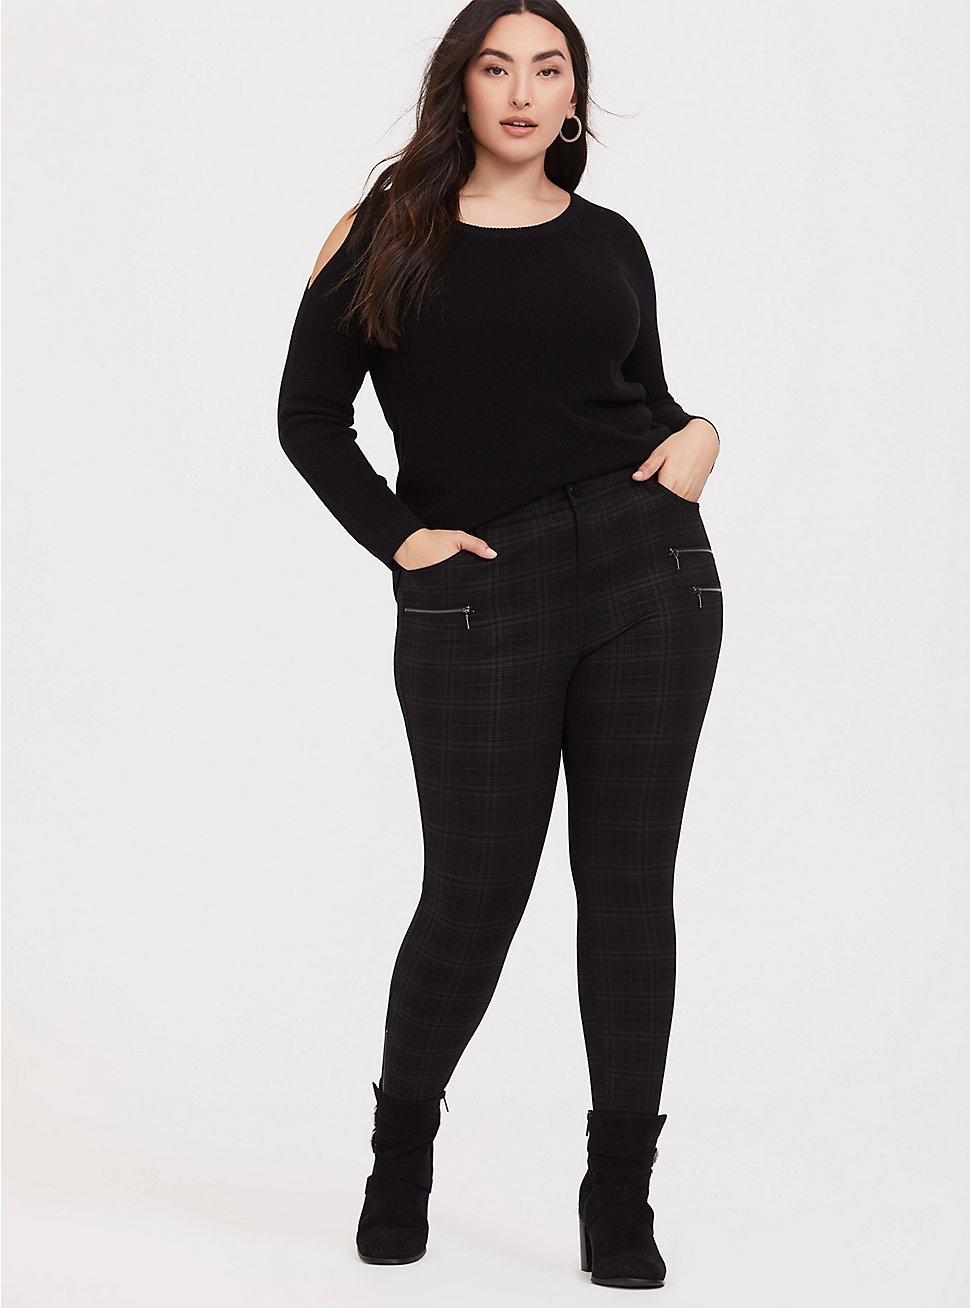 Black & Dark Grey Plaid Ponte Ankle Skinny Pant, PLAID, hi-res